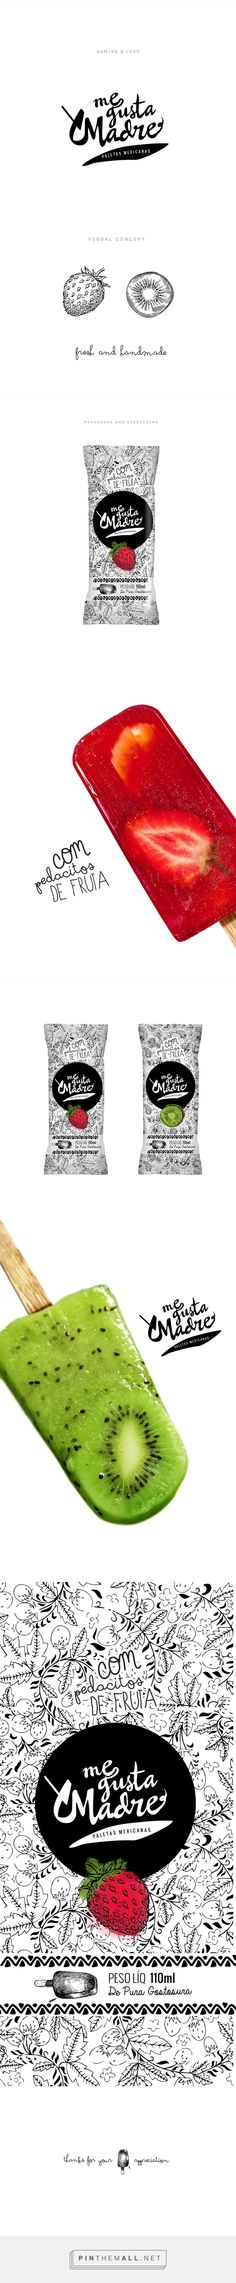 Branding and packaging design for Me Gusta Madre Ice Cream. Ice Cream Packaging, Cool Packaging, Tea Packaging, Food Packaging Design, Beverage Packaging, Brand Packaging, Food Branding, Food Design, E Design